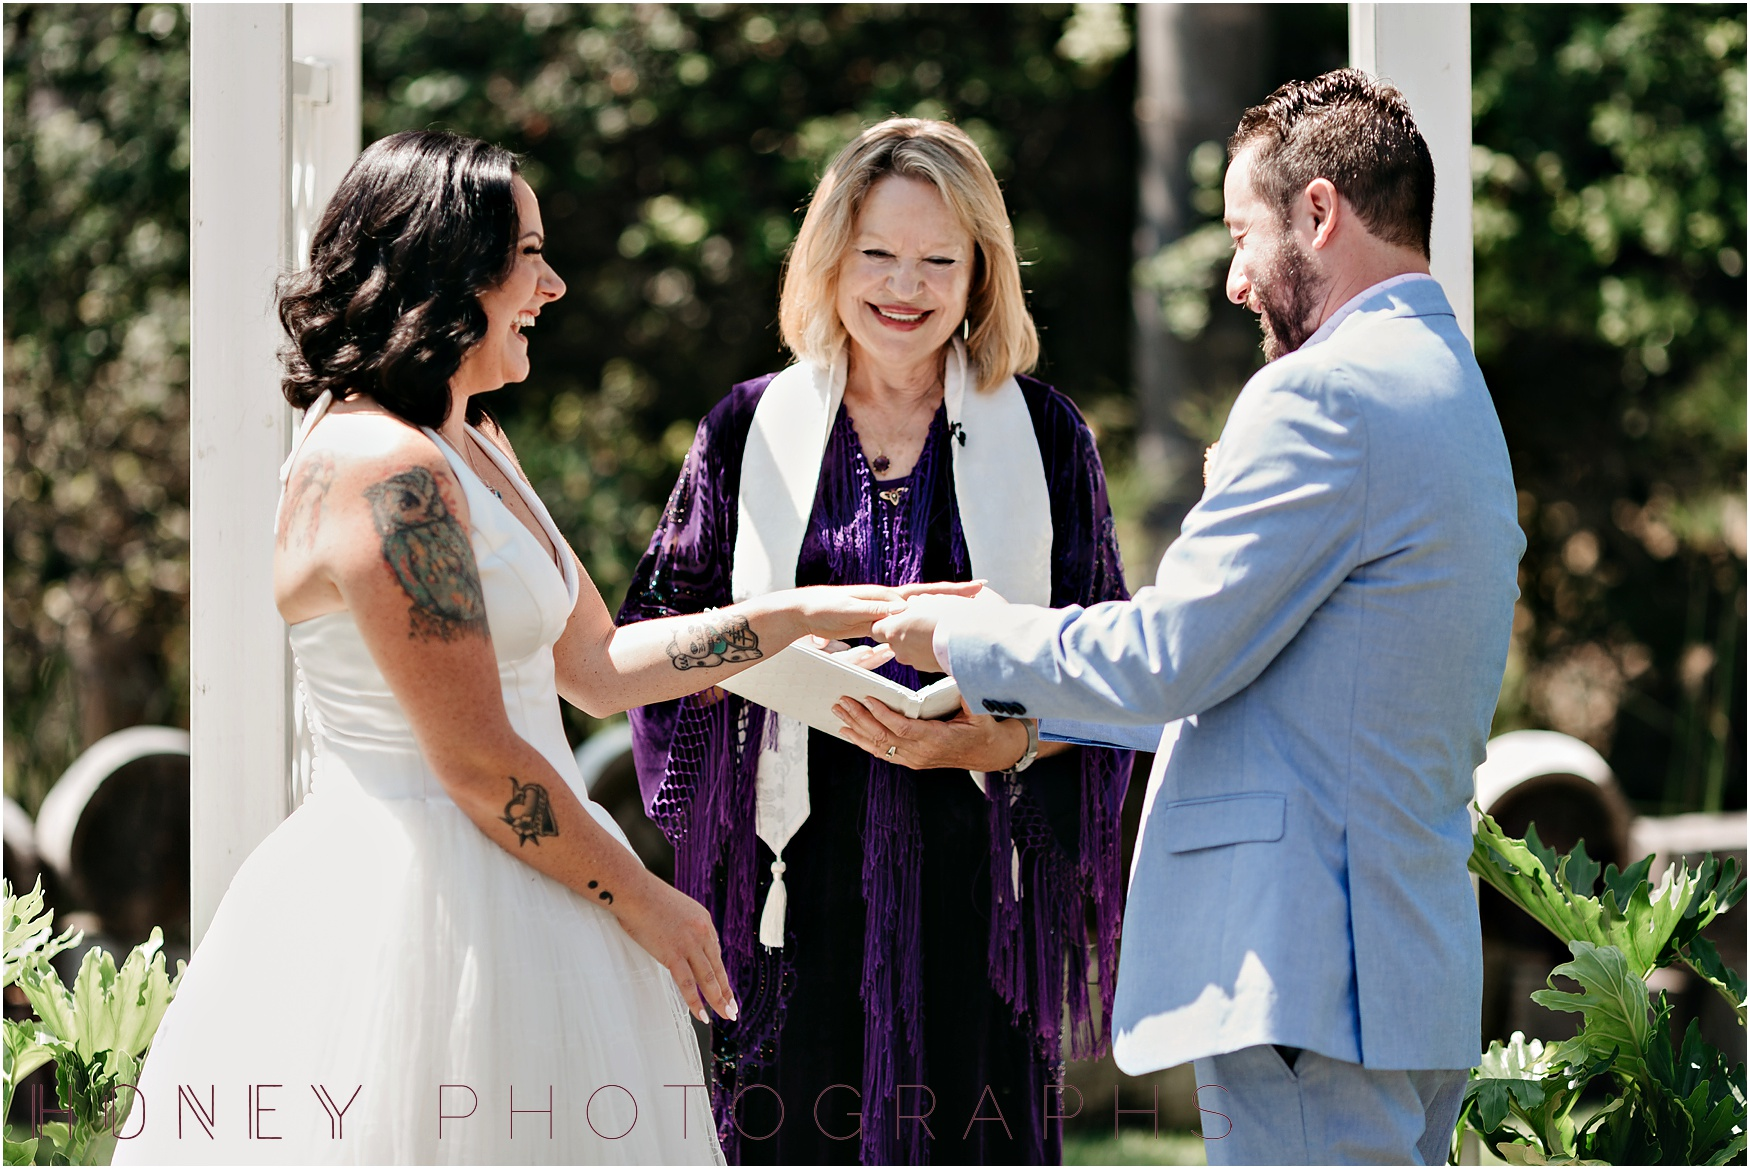 colorful_ecclectic_vibrant_vista_rainbow_quirky_wedding022.jpg